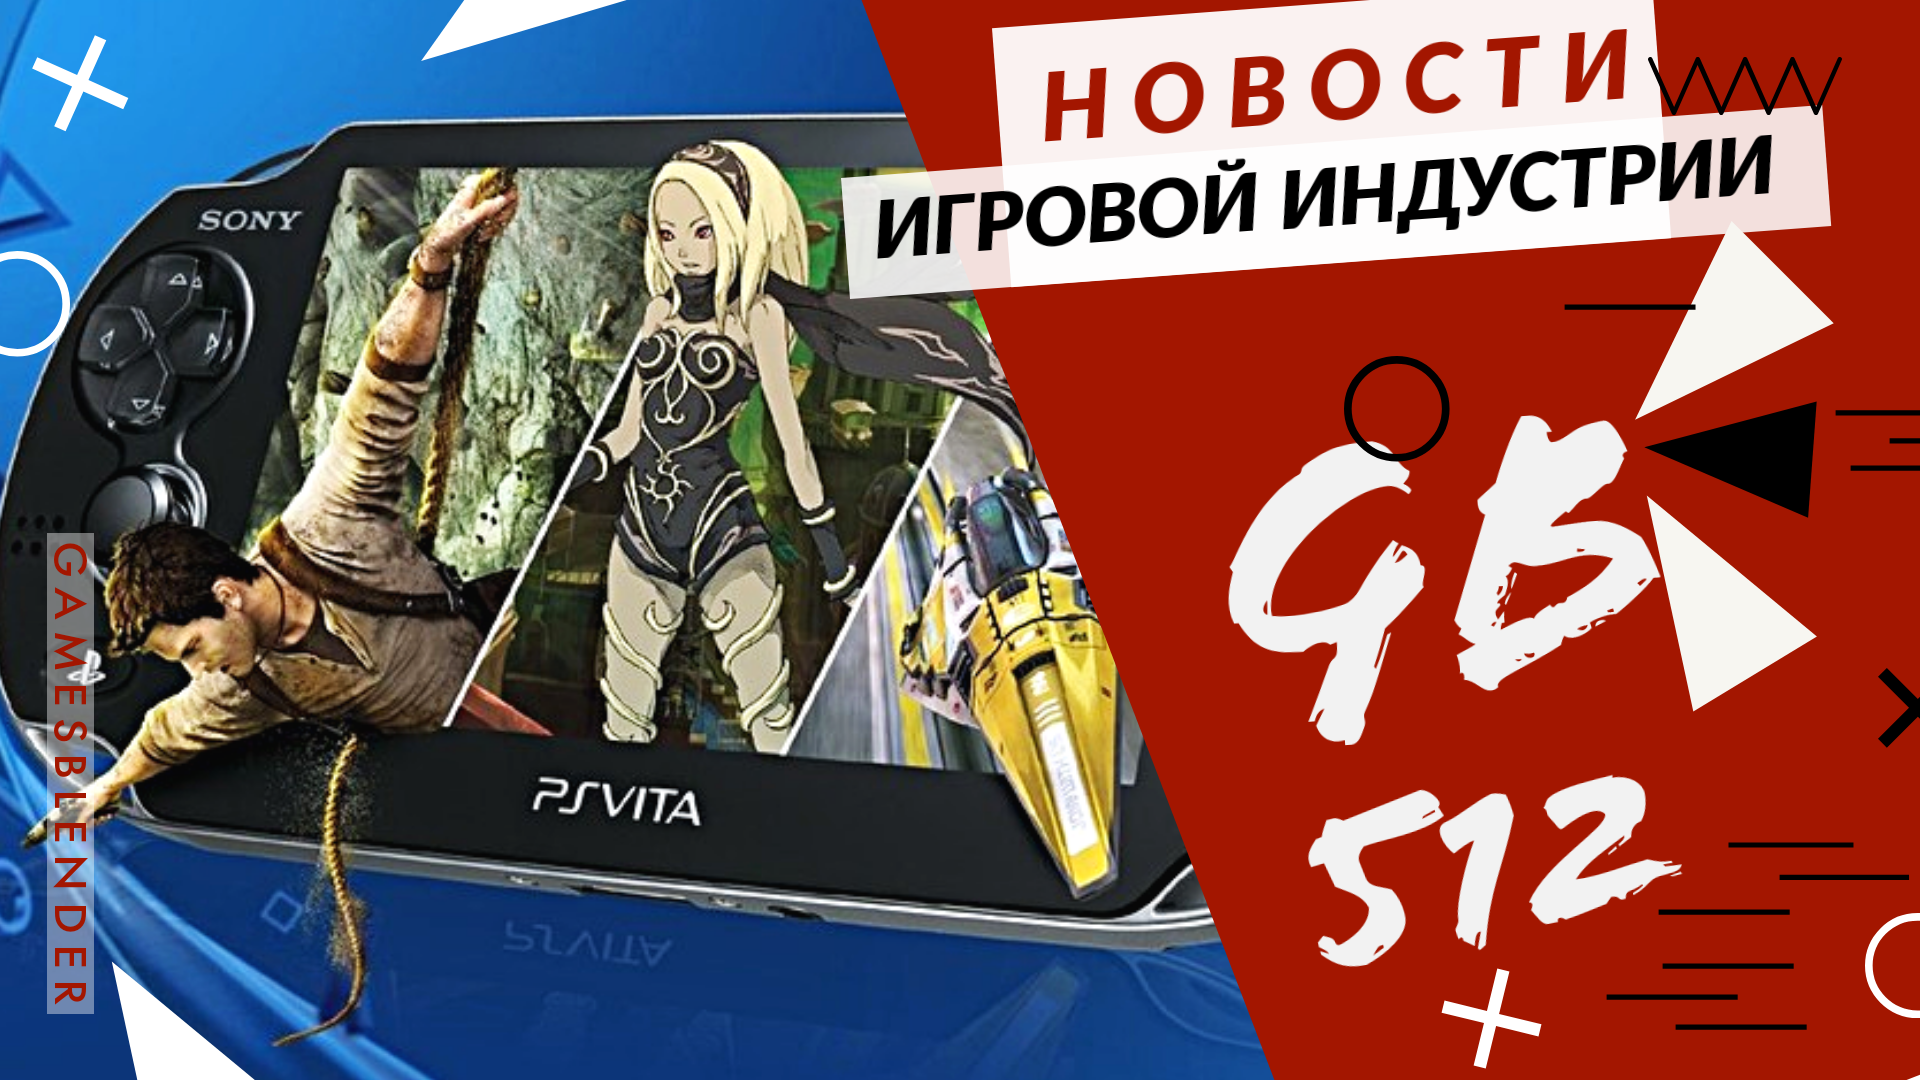 Gamesblender № 512: будущее CD Projekt RED, повышение цены PS5 и закрытие старых PS Store